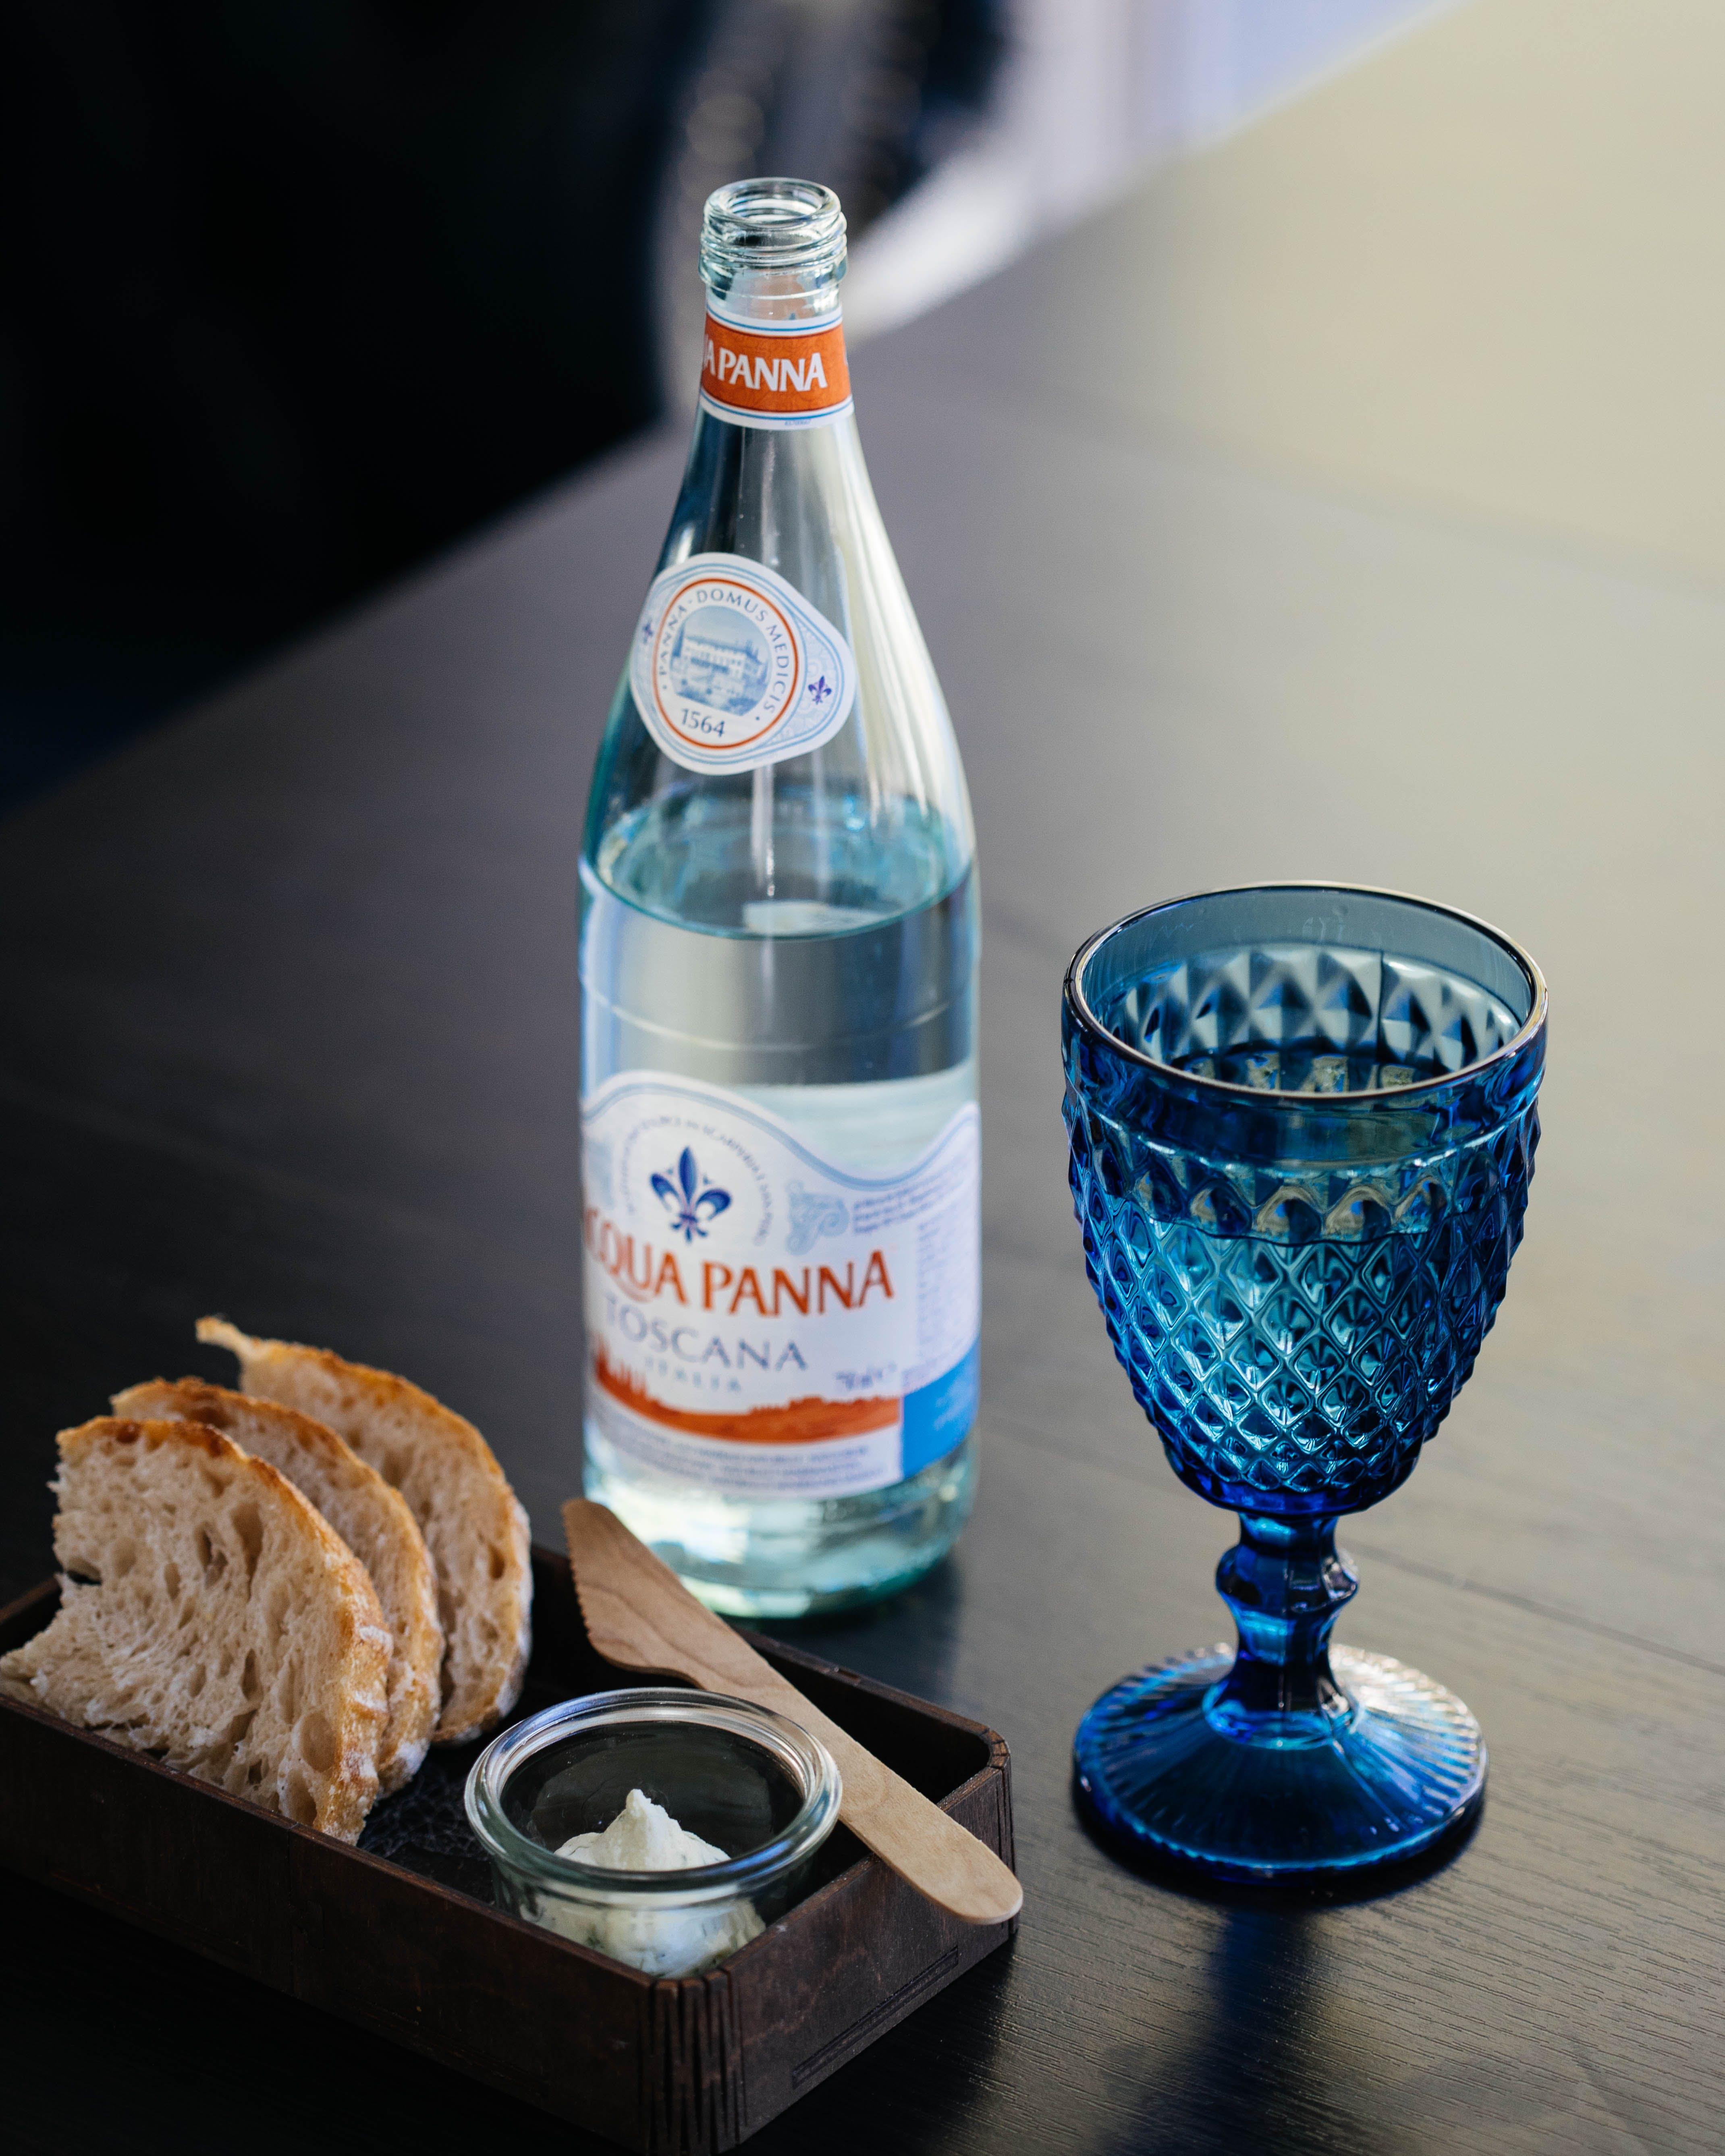 Close-Up Photo of Liquor Bottle